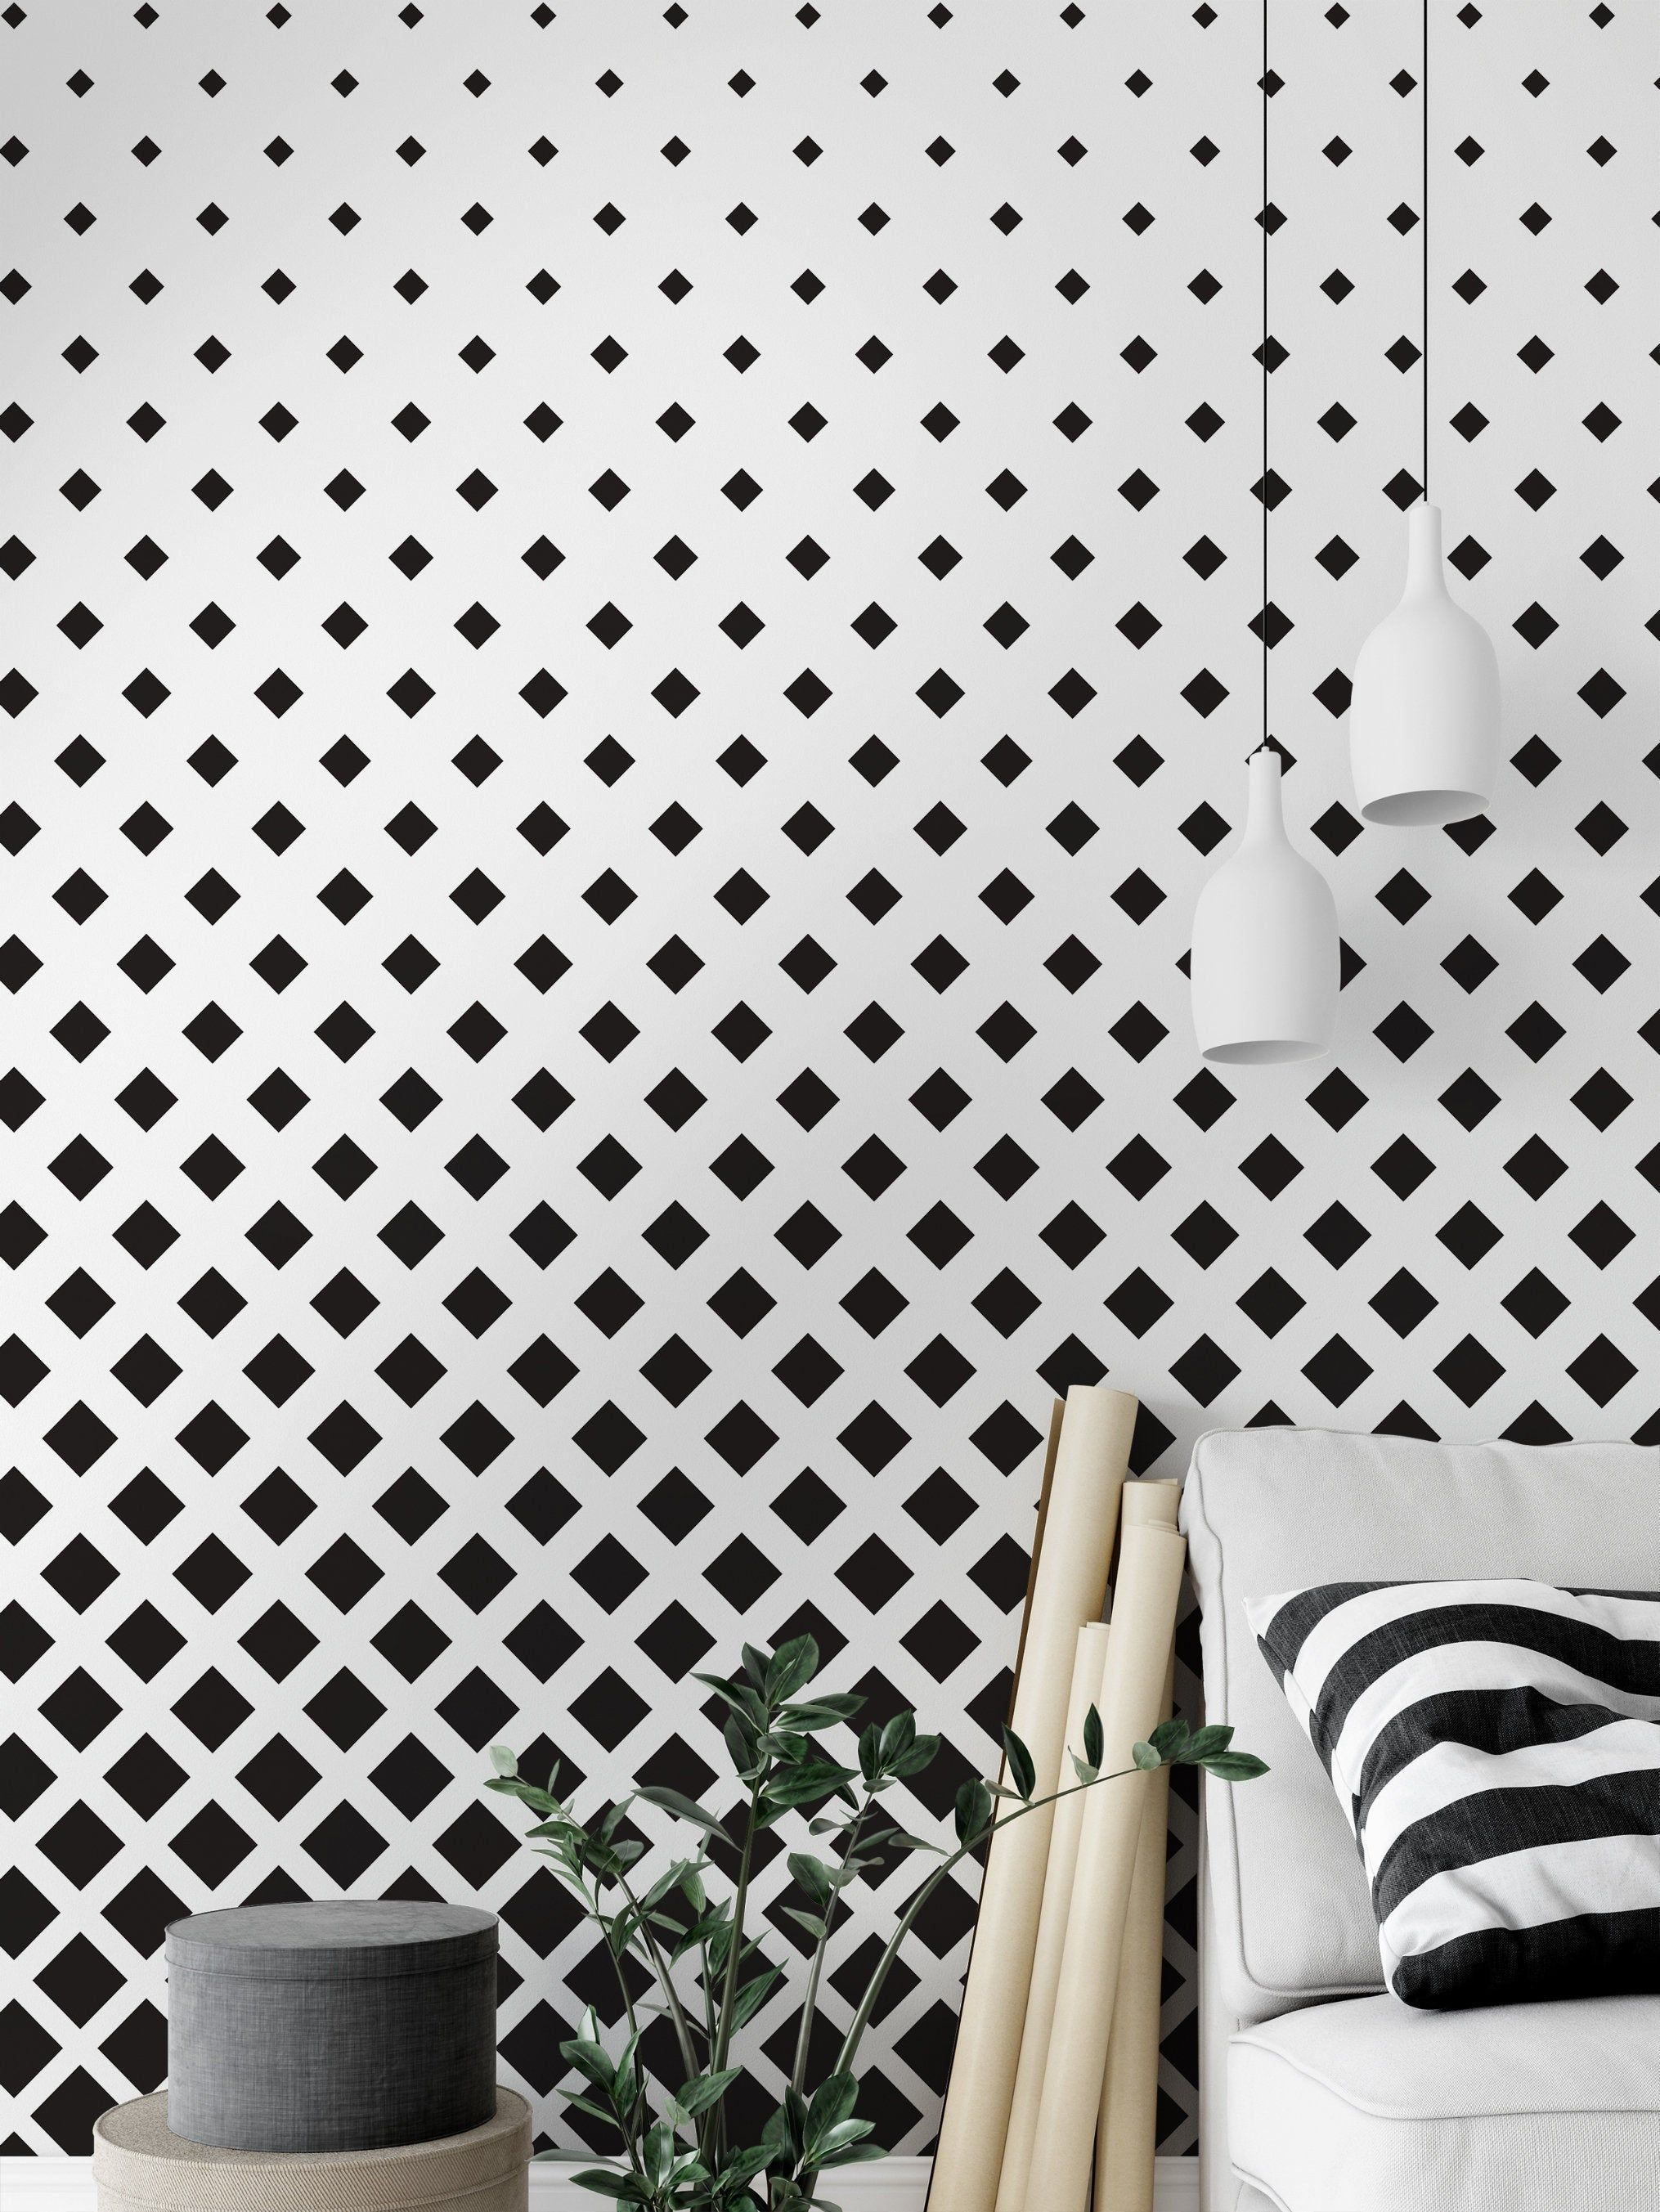 Black White Moroccan Design Removable Wallpaper Peel And Etsy Moroccan Design Moroccan Wallpaper Removable Wallpaper